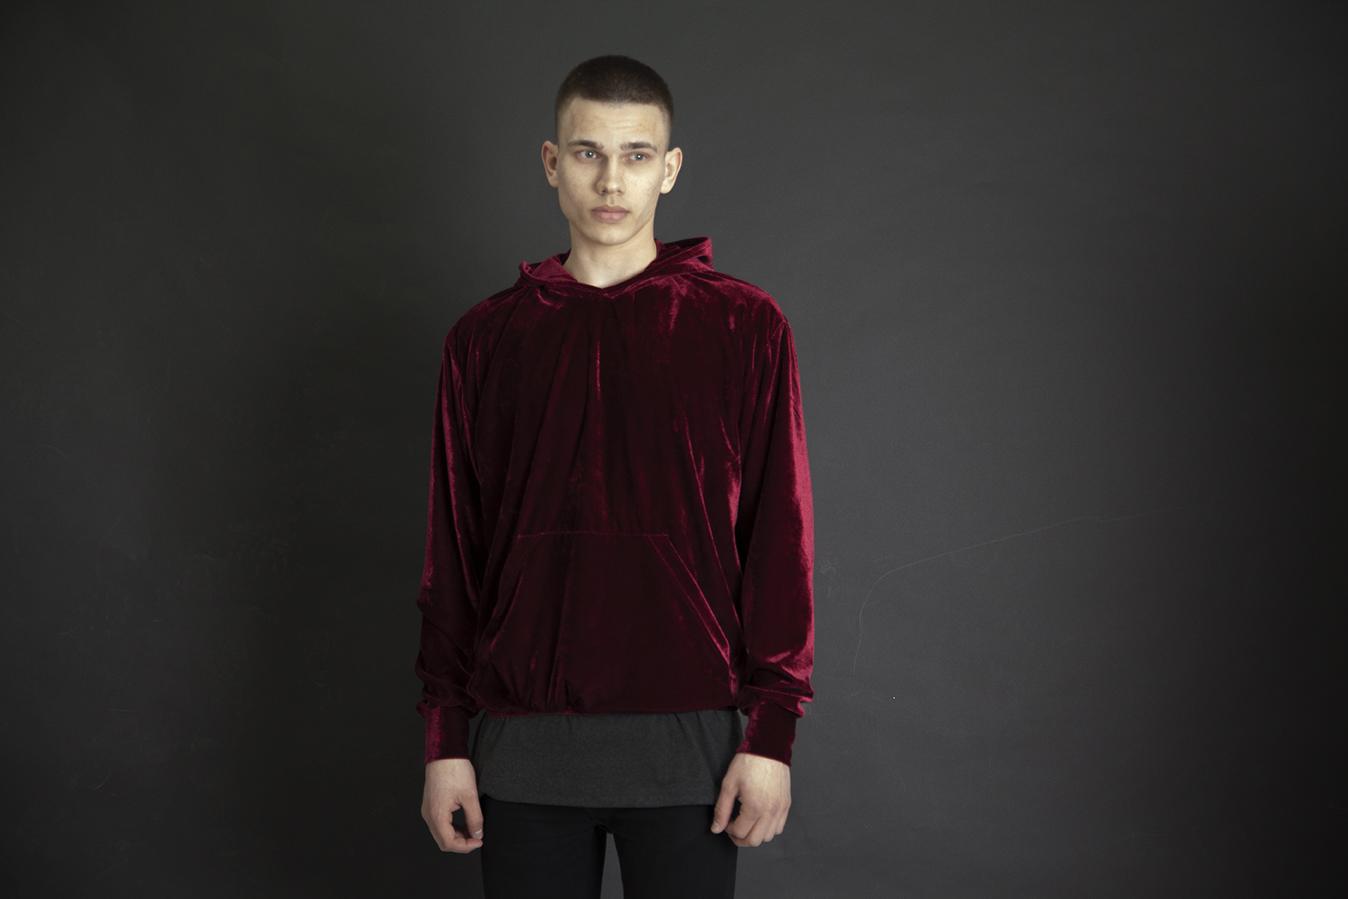 queu-queuburgundy-velvet-hoodie-lookbook